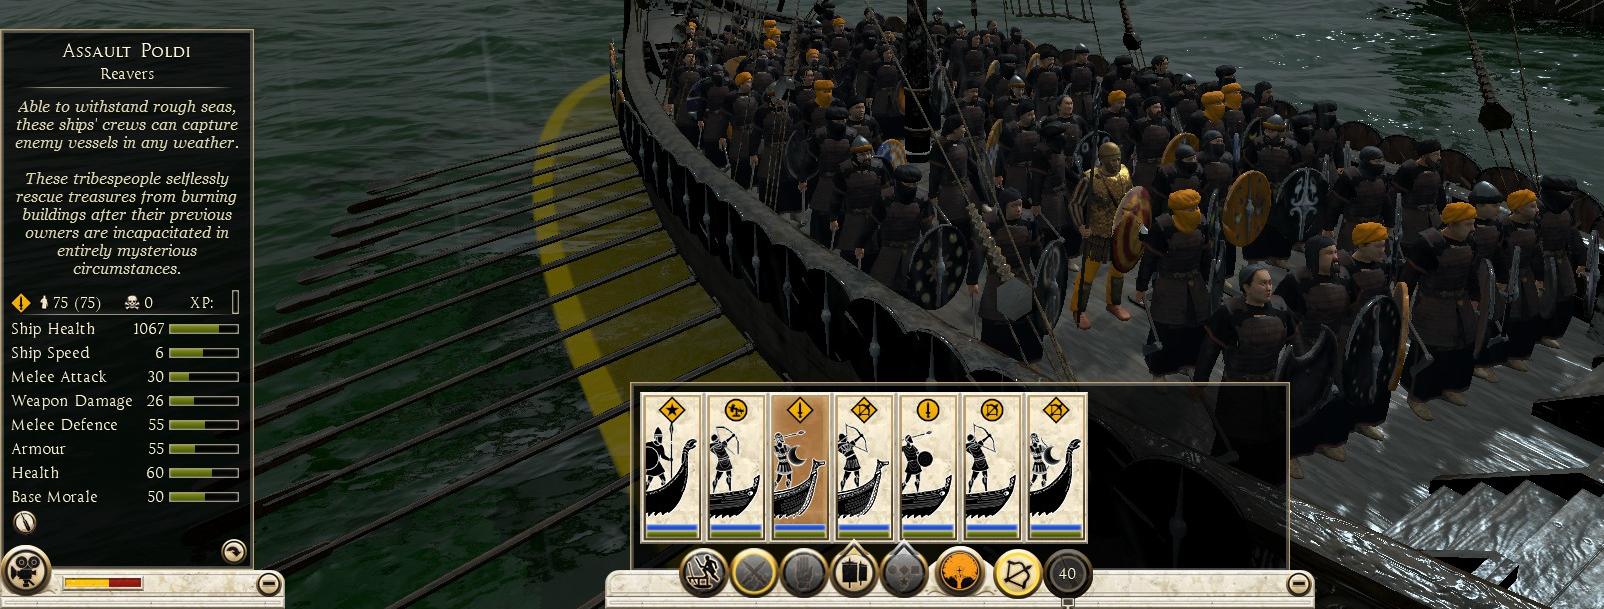 Assault Poldi, Reavers